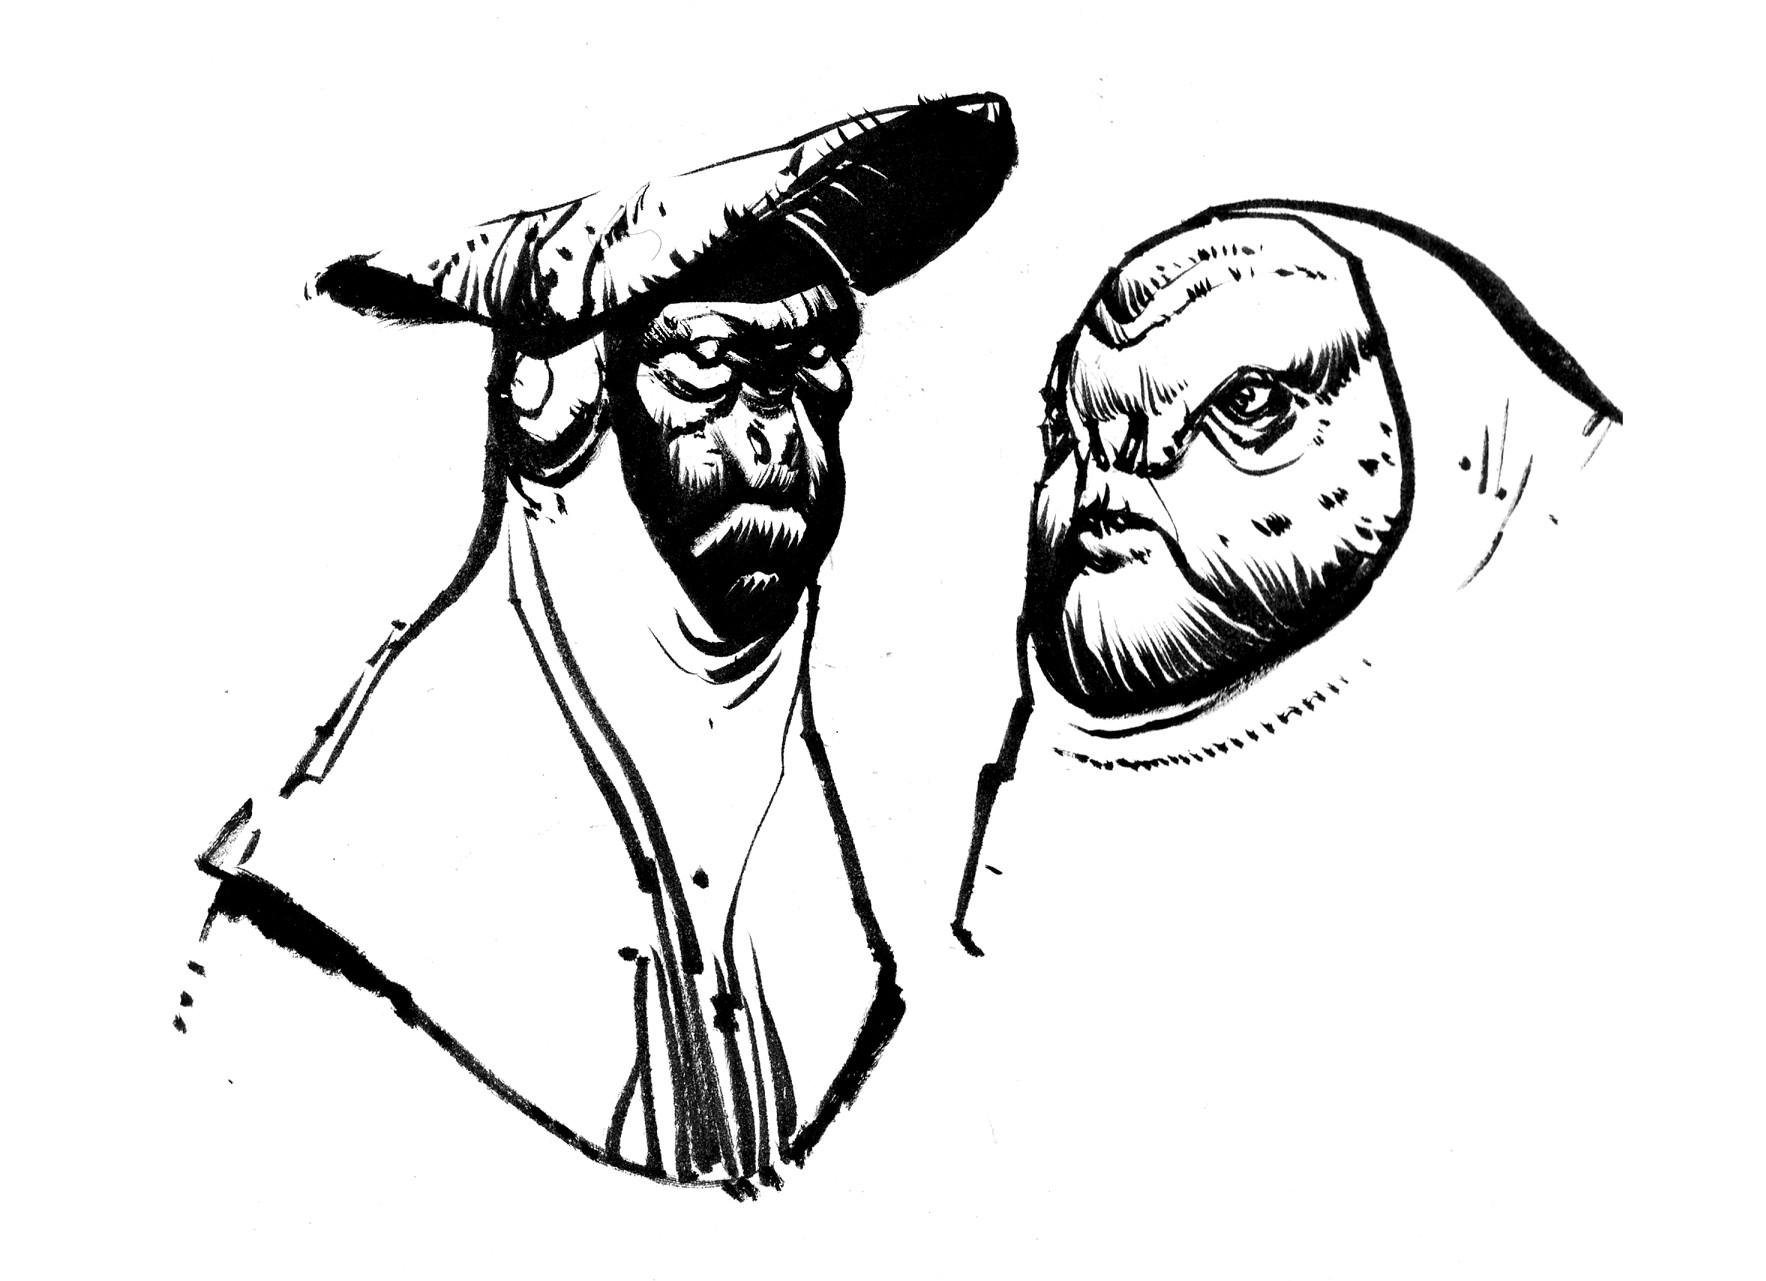 Renaud roche valerian sketches02web